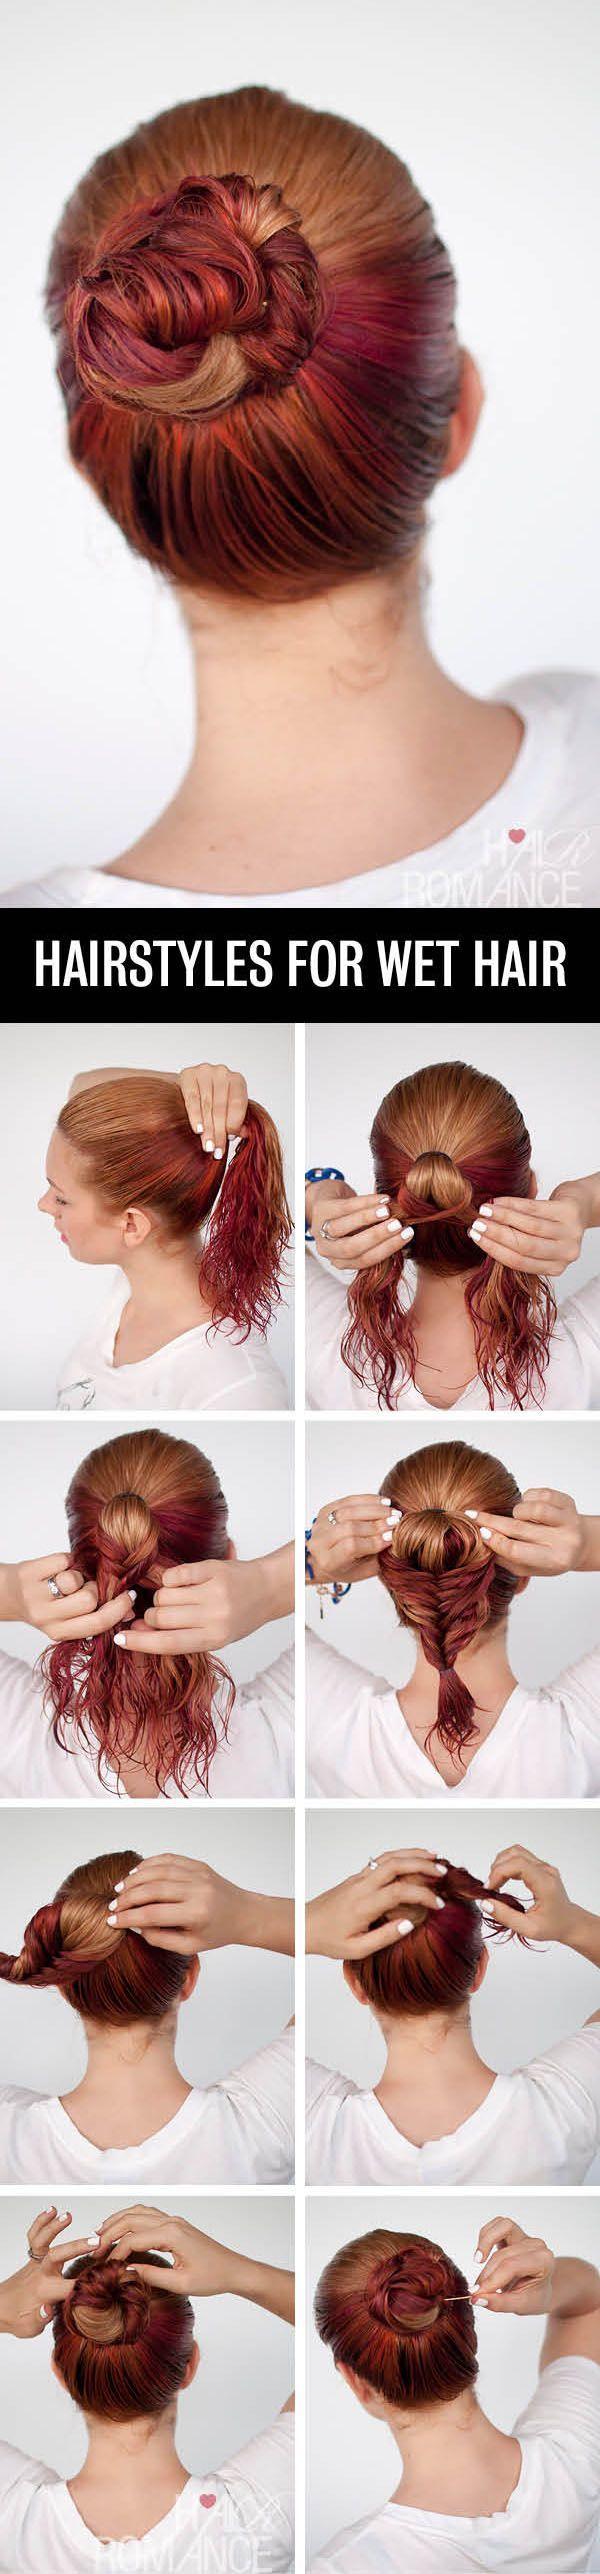 Phenomenal 1000 Ideas About Wet Hair Hairstyles On Pinterest Wet Short Hairstyles Gunalazisus